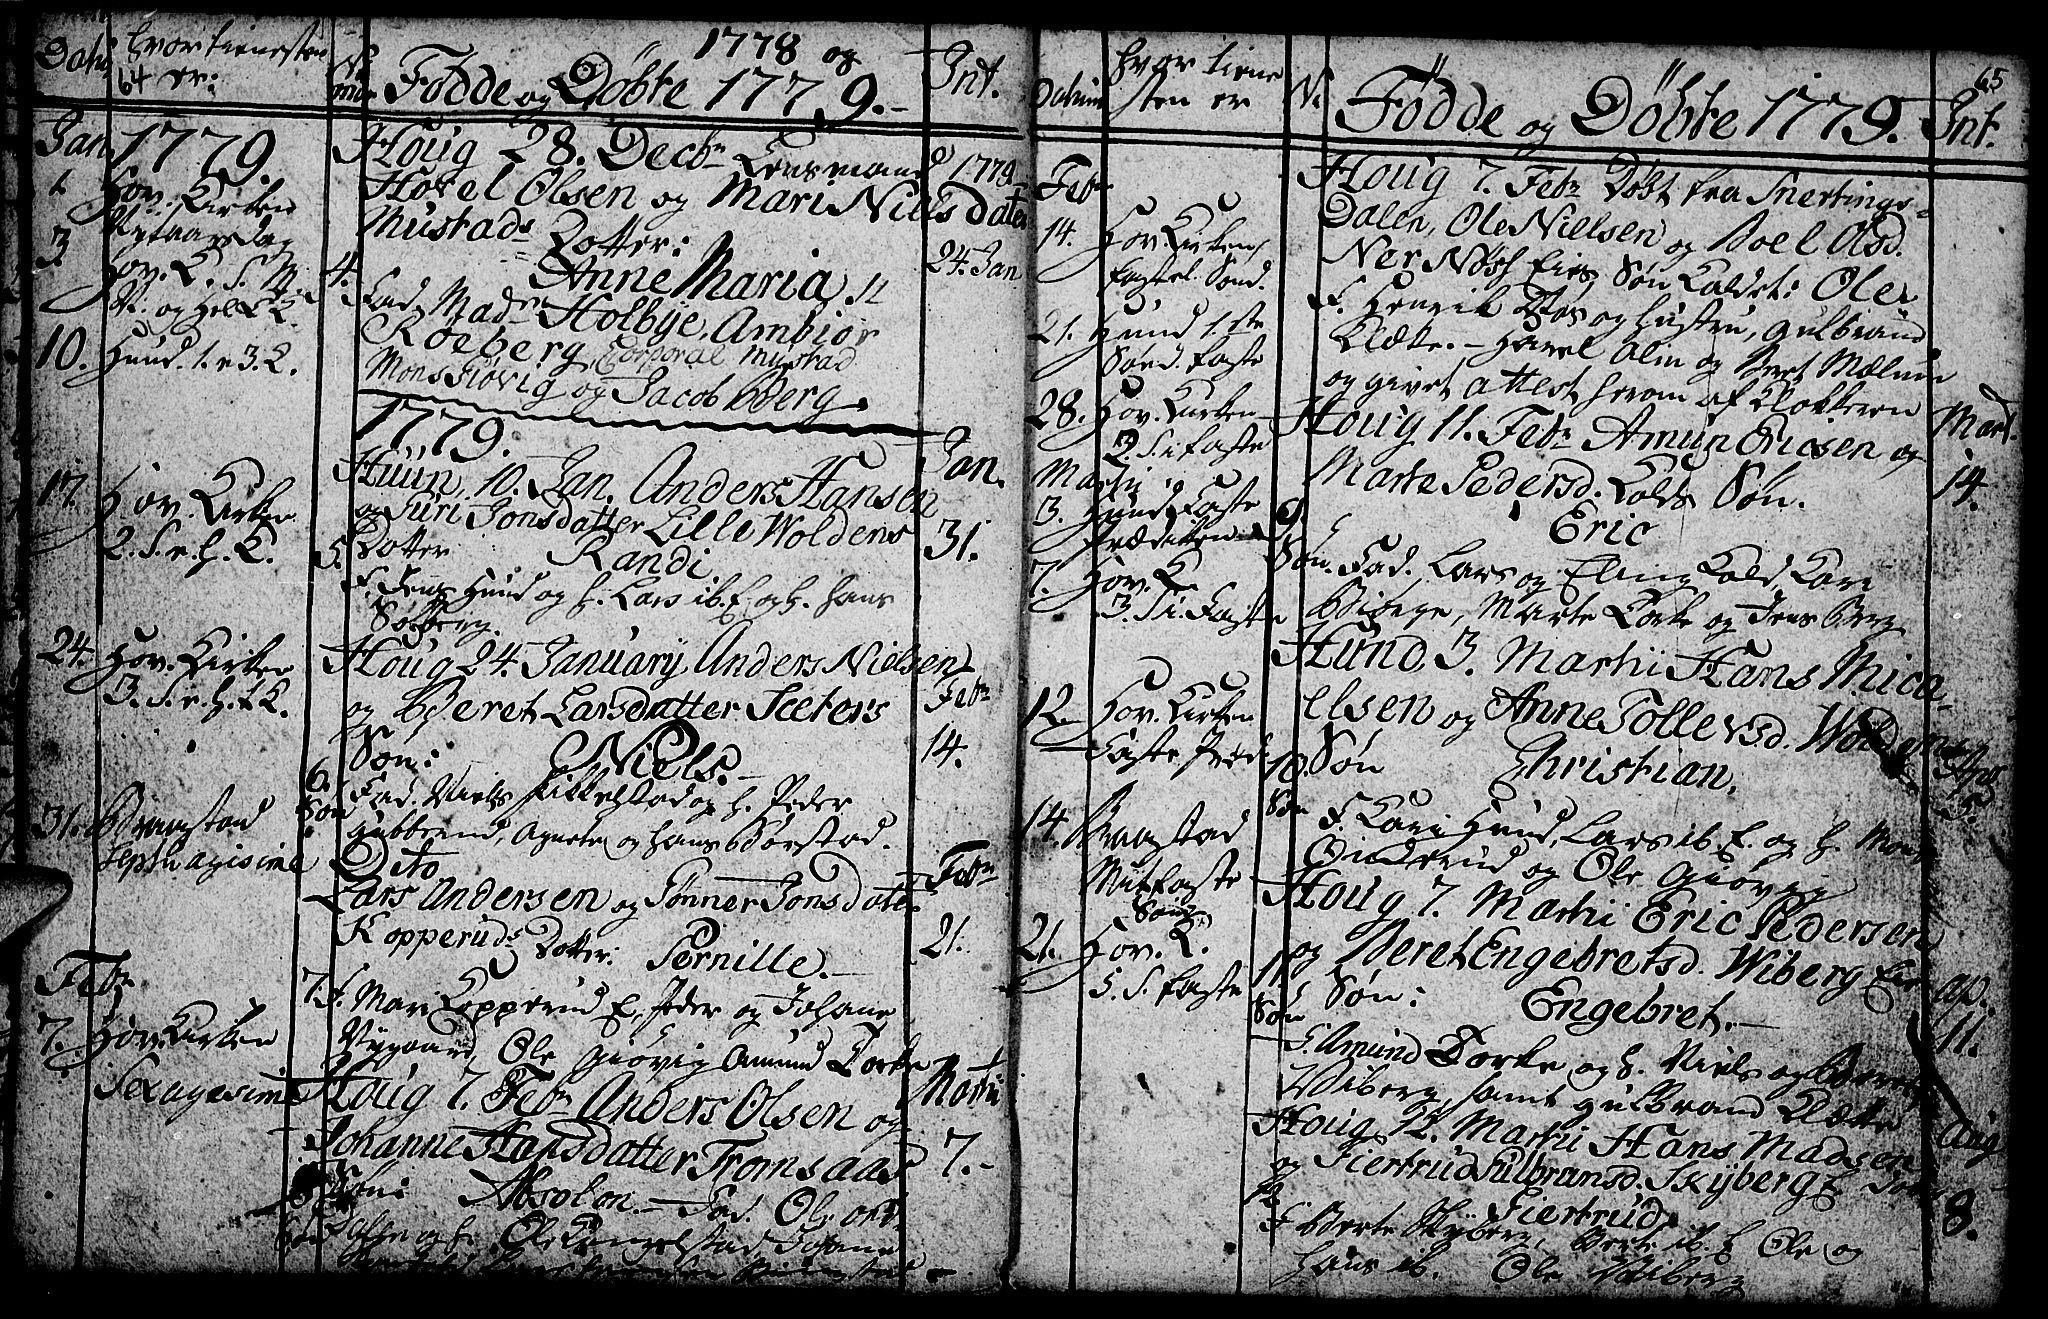 SAH, Vardal prestekontor, H/Ha/Hab/L0001: Klokkerbok nr. 1, 1771-1790, s. 64-65